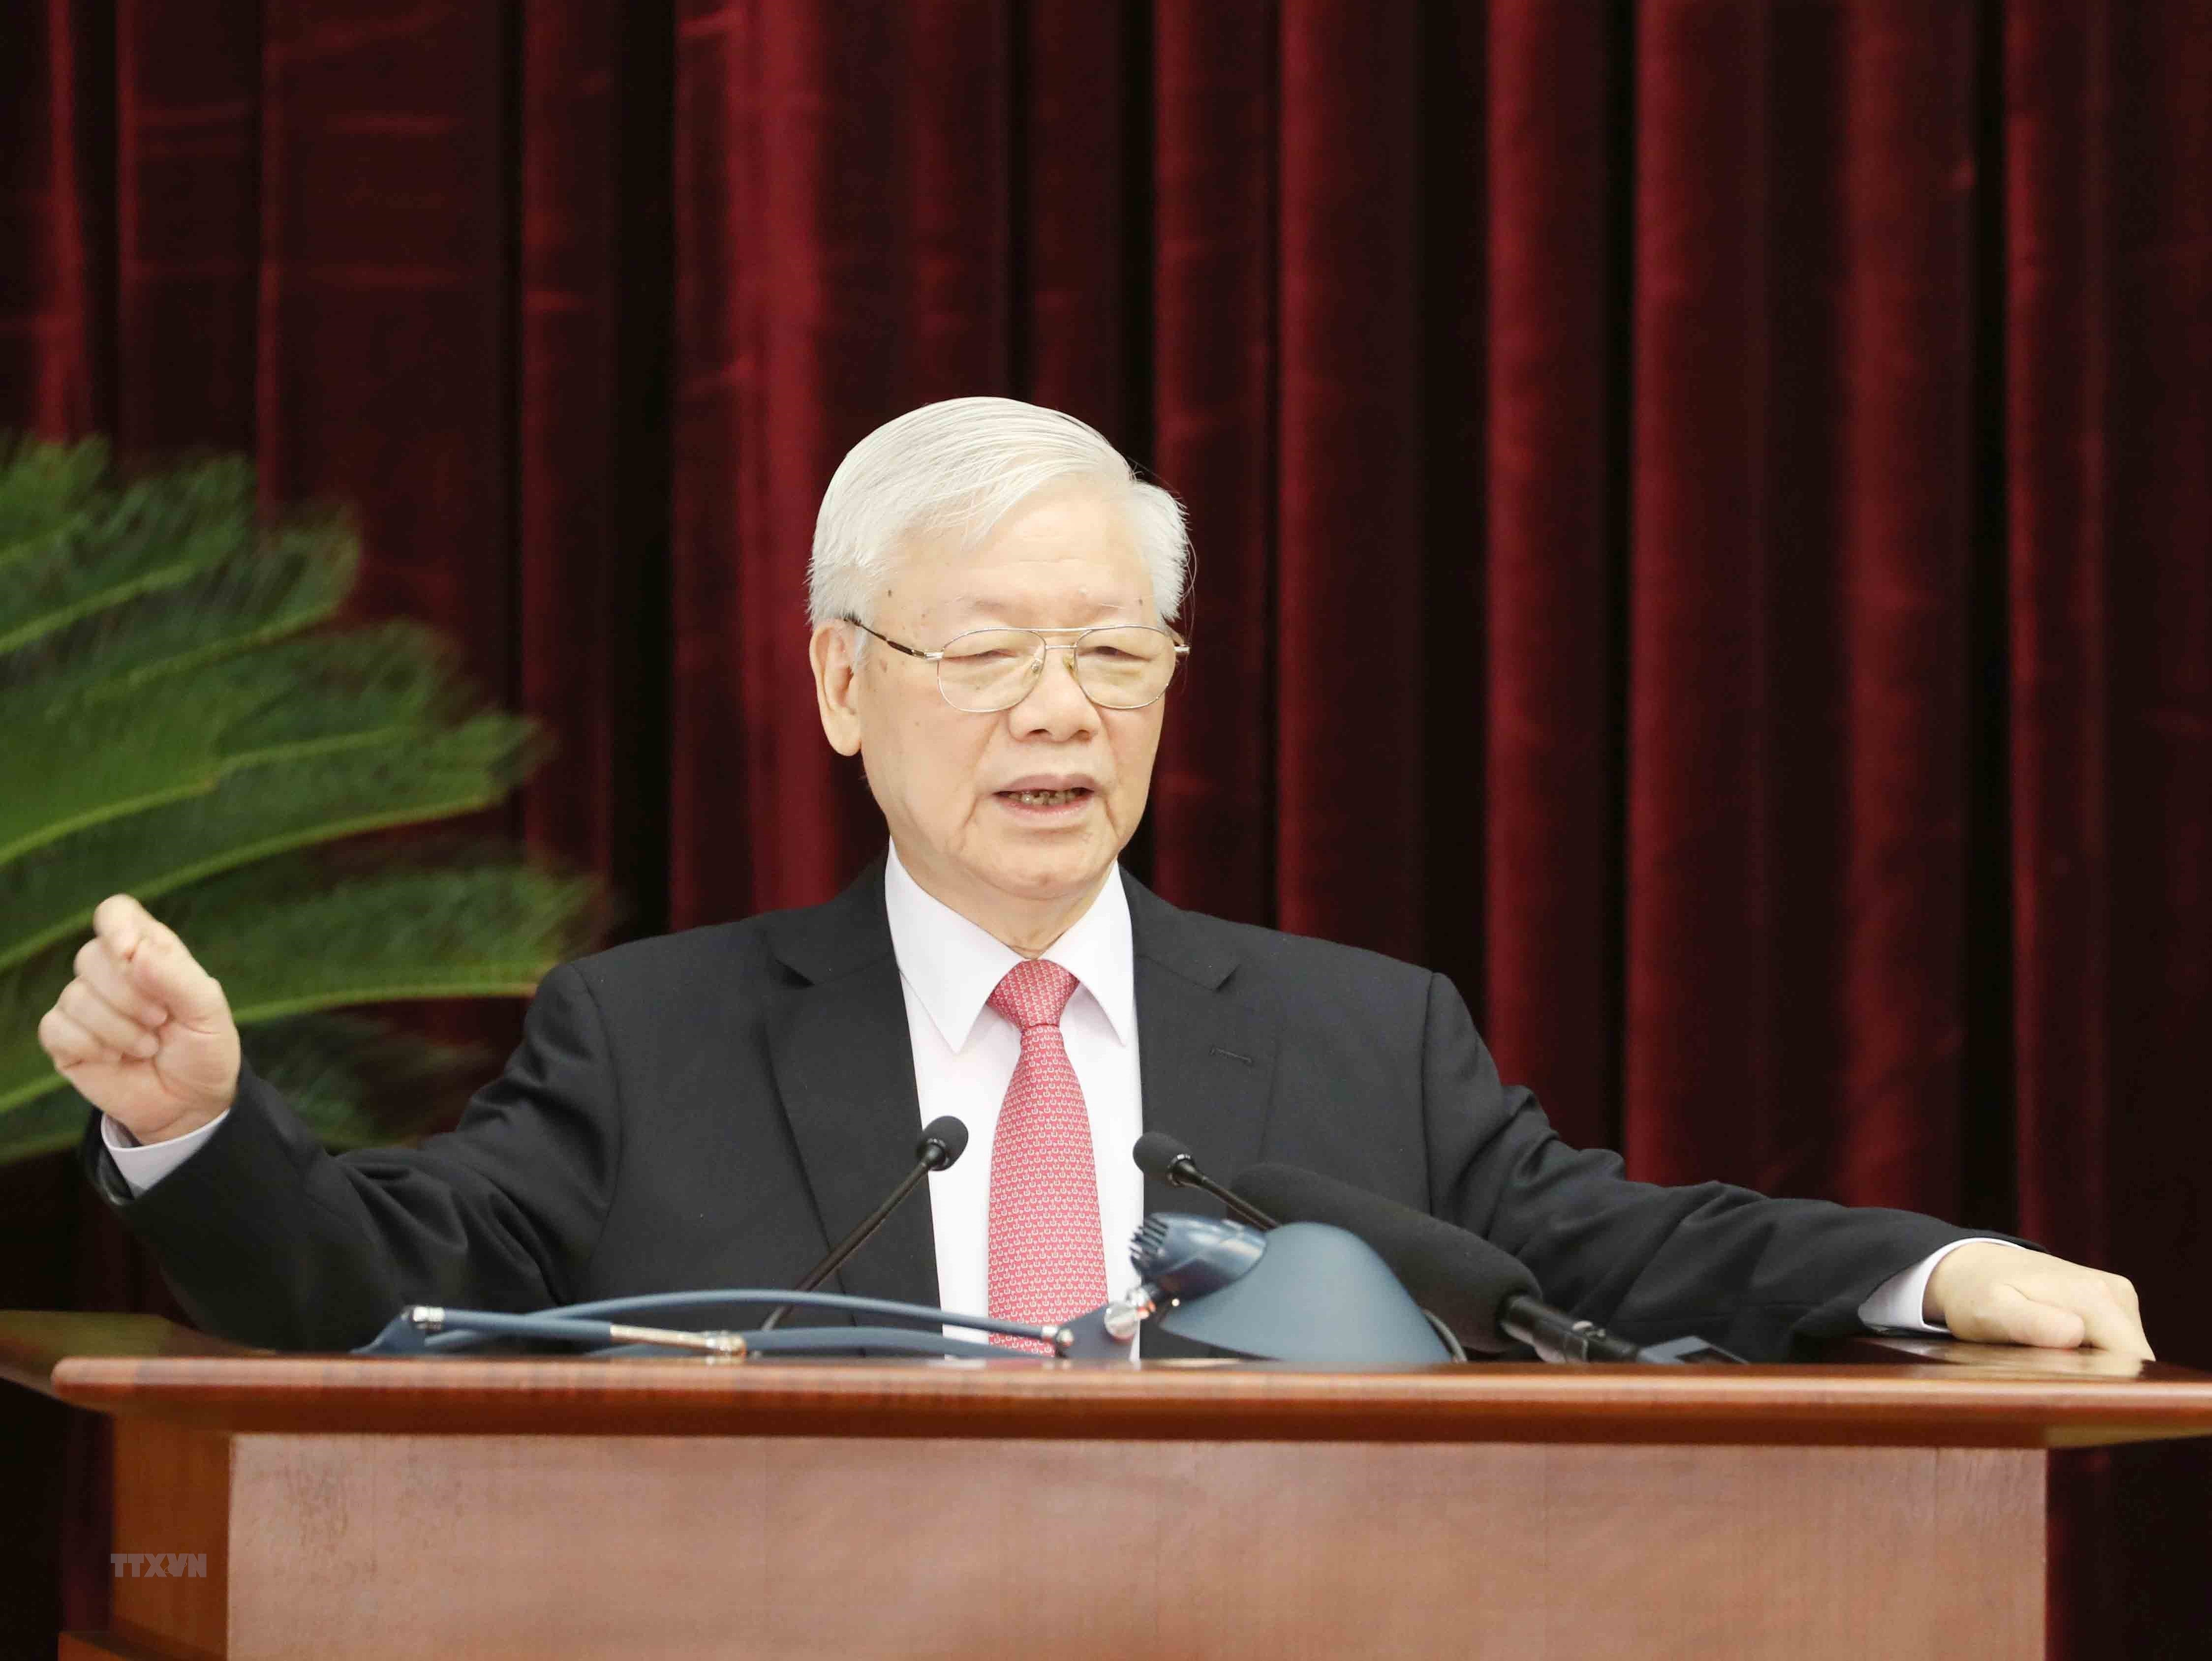 Tong Bi thu: Tien hanh thang loi cuoc bau cu dai bieu Quoc hoi va HDND hinh anh 1